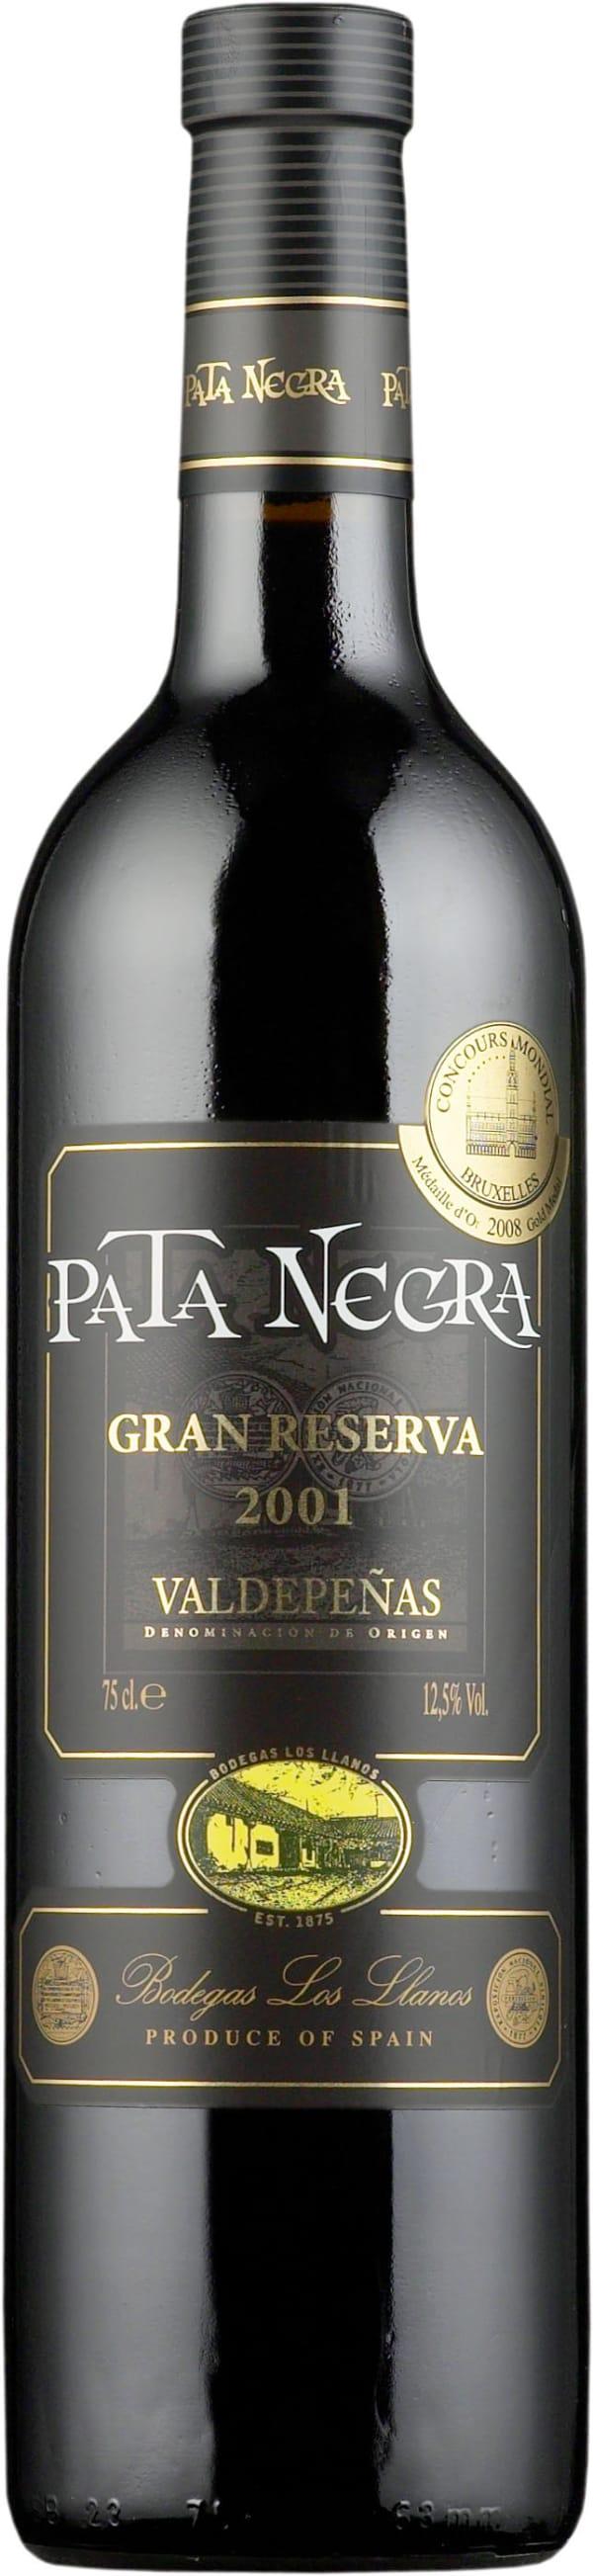 Pata Negra Gran Reserva 2009